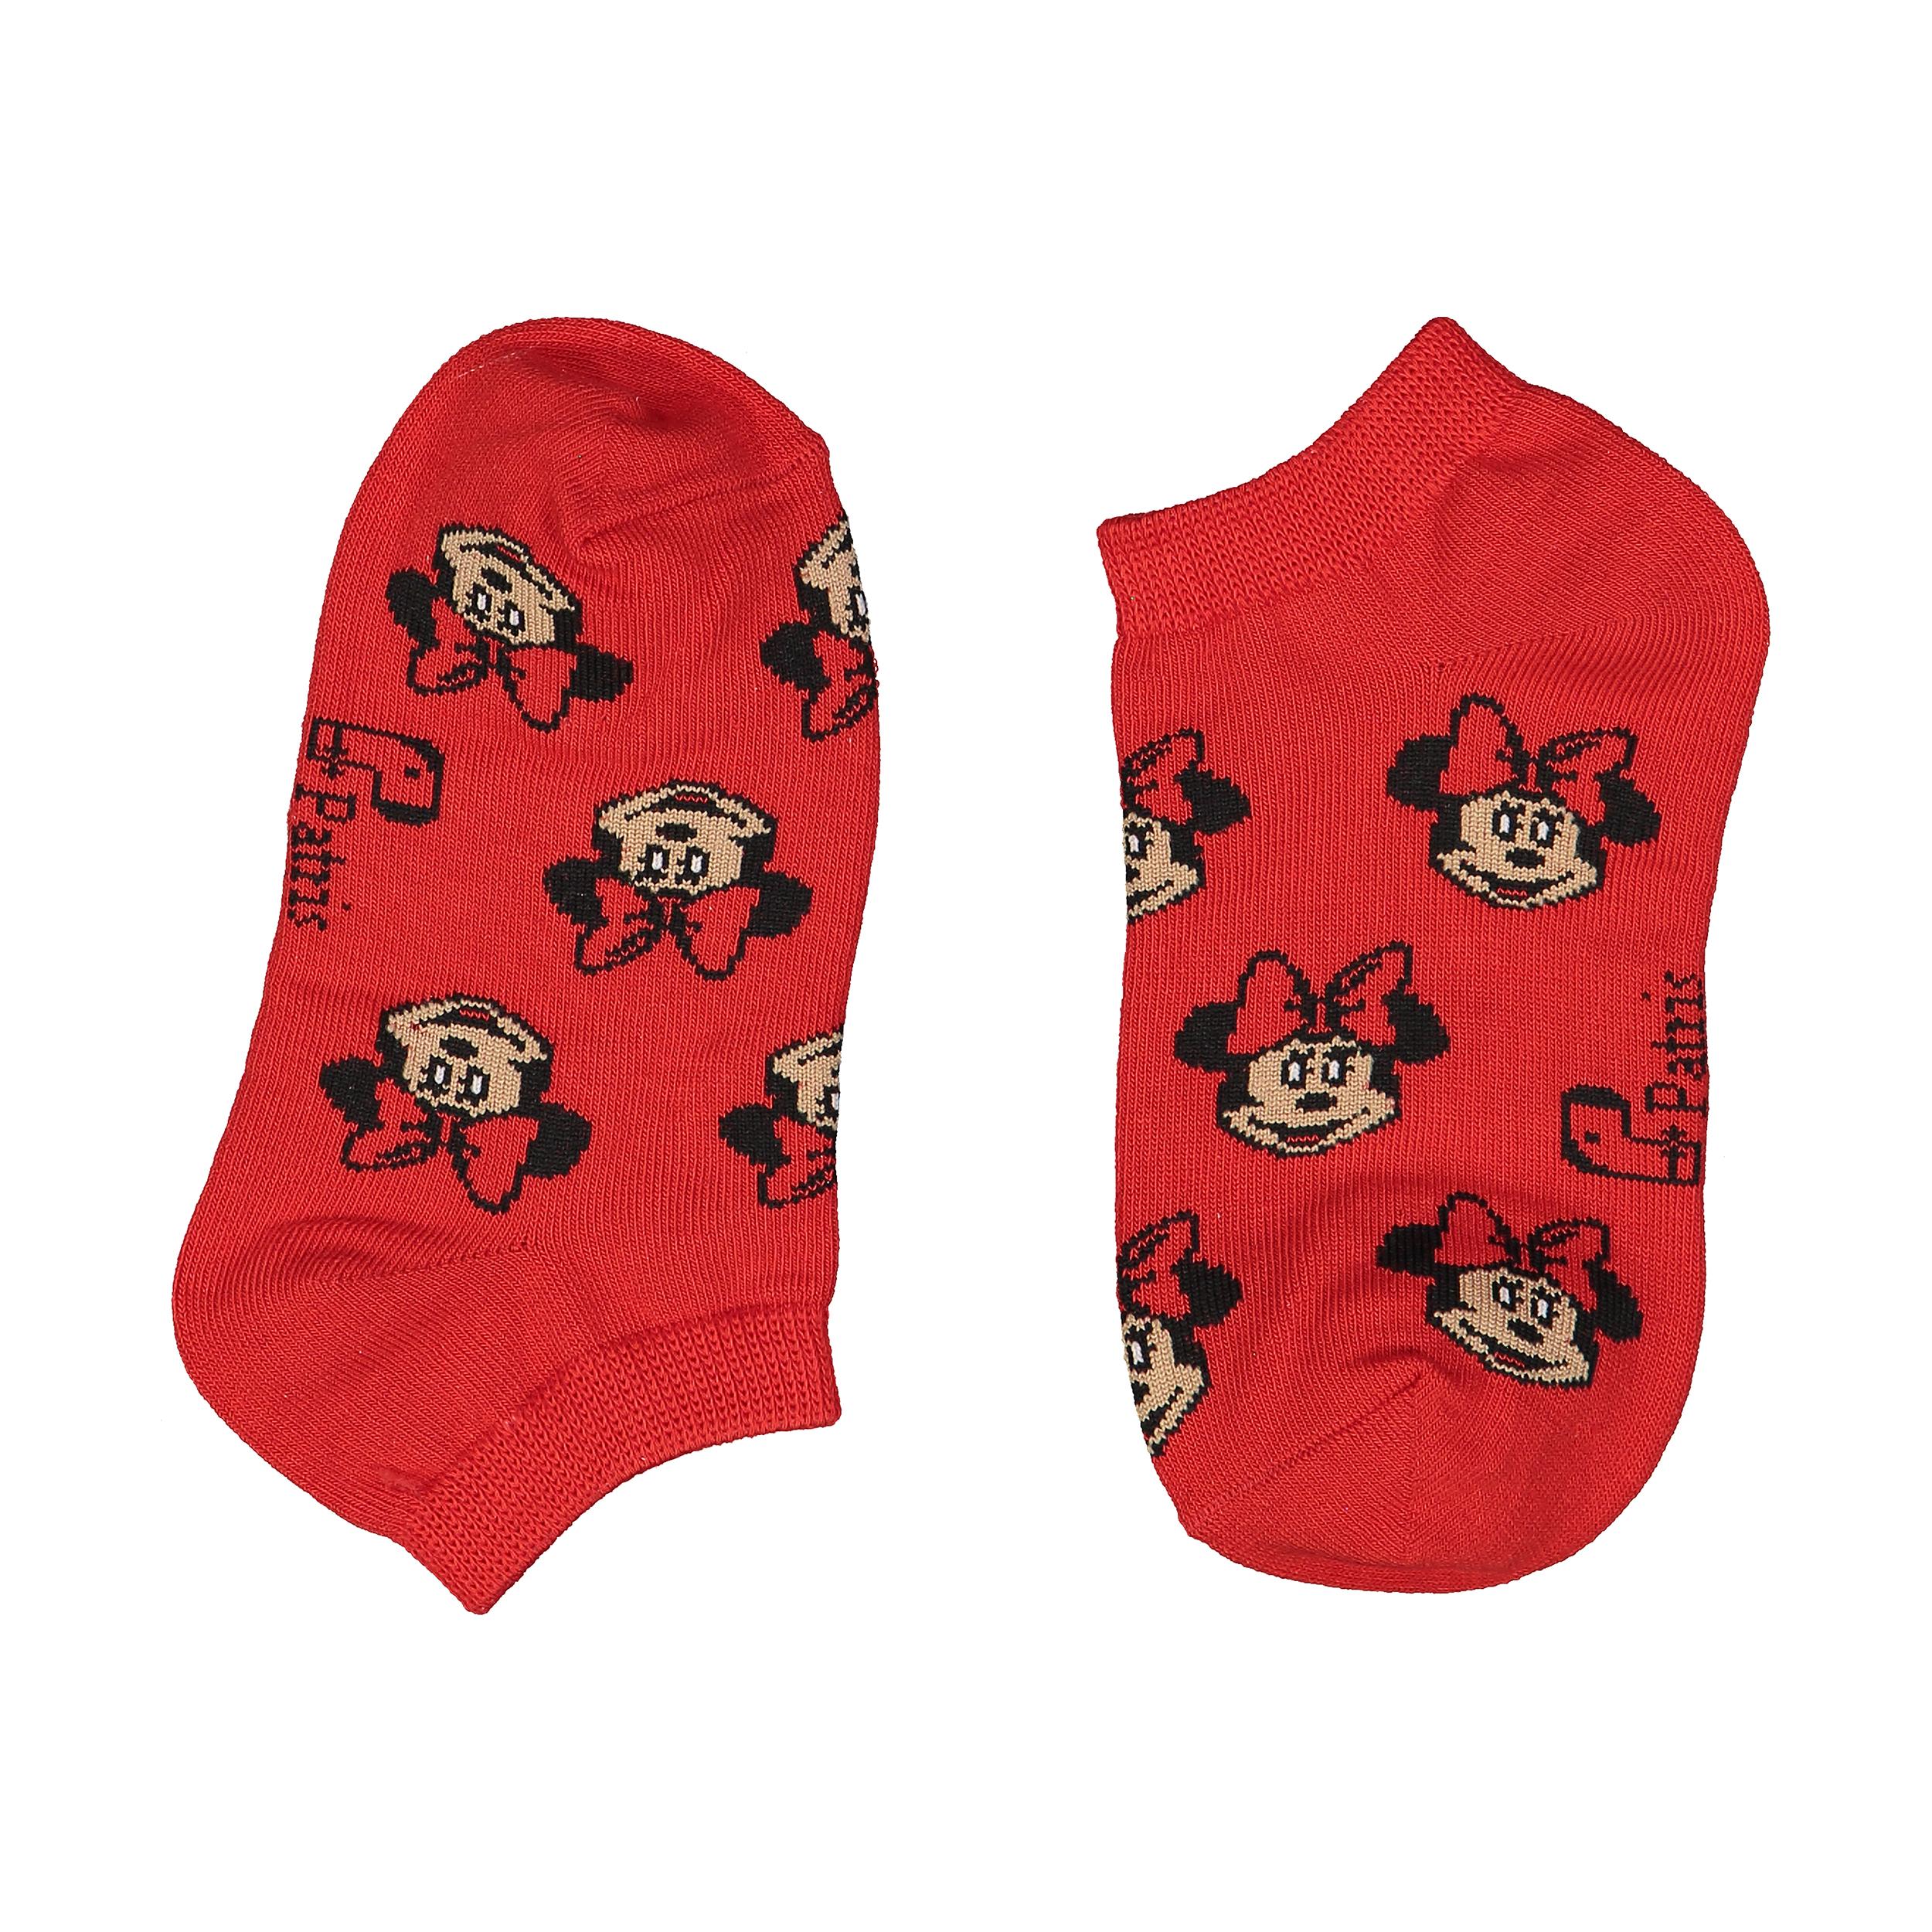 جوراب دخترانه پاتریس طرح مینی موس مدل 2271183-72